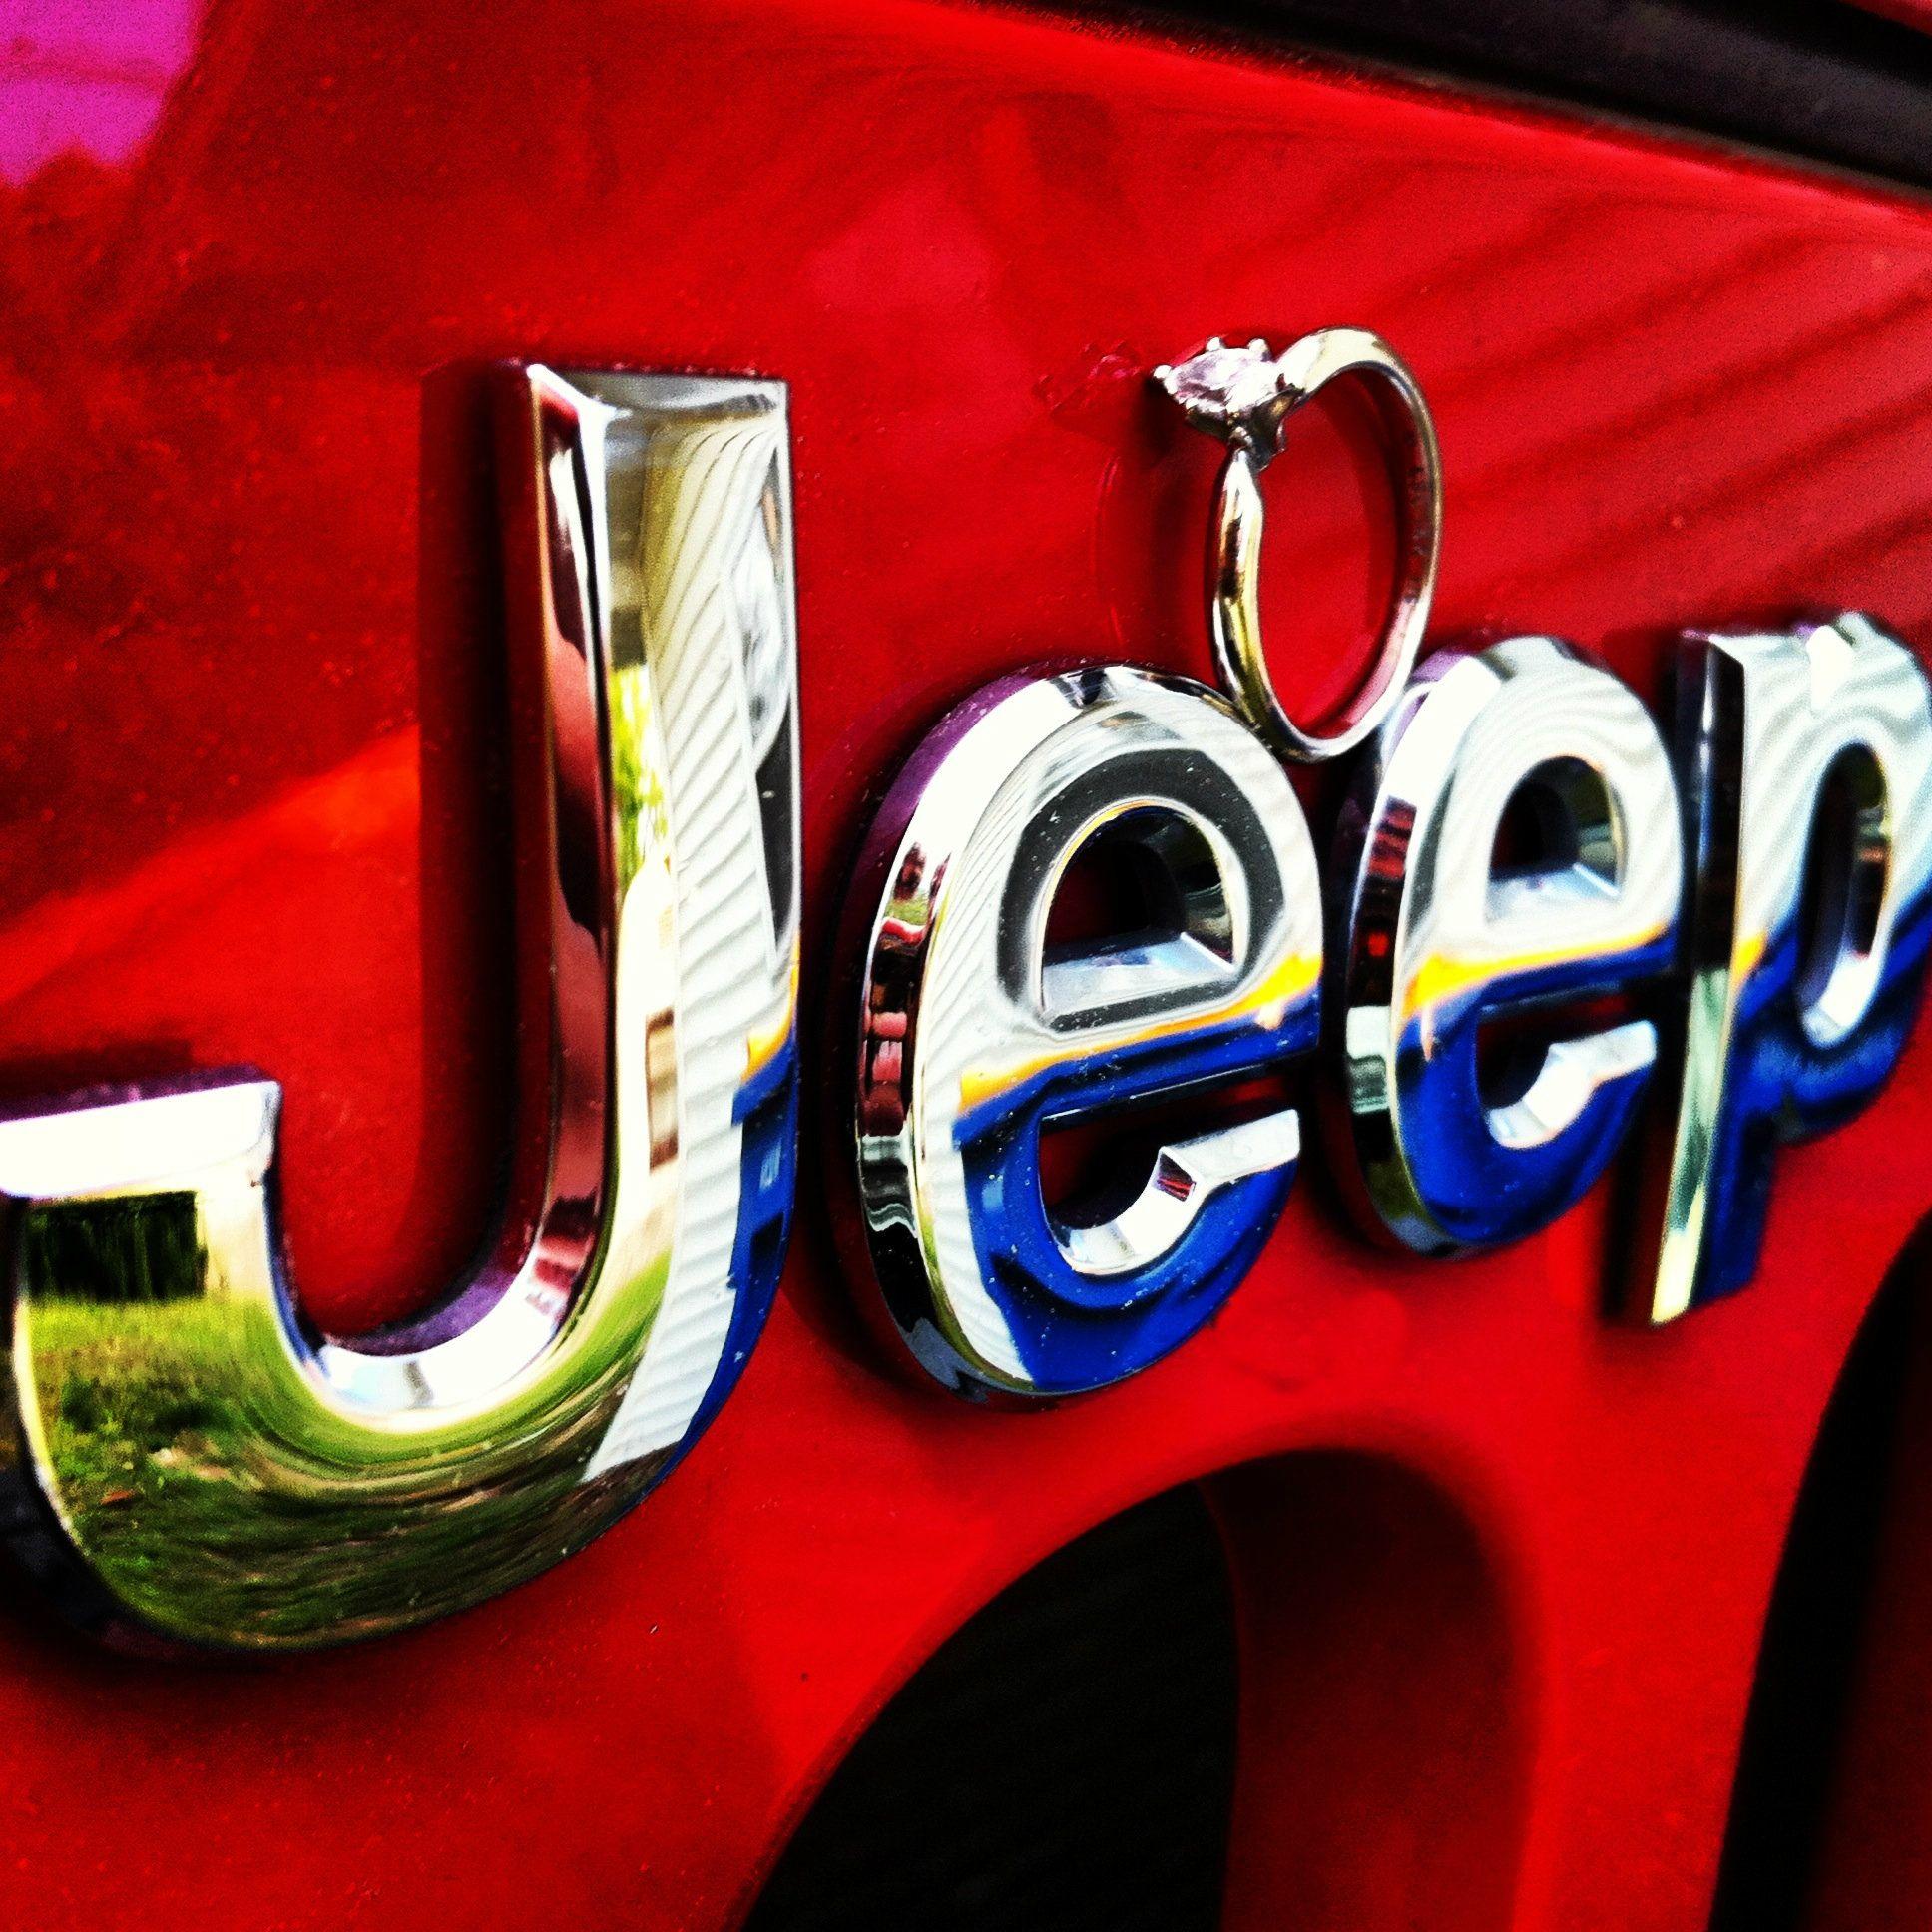 Pin by Lee Ekstrom on Jeep Theme Wedding Ideas | Jeep